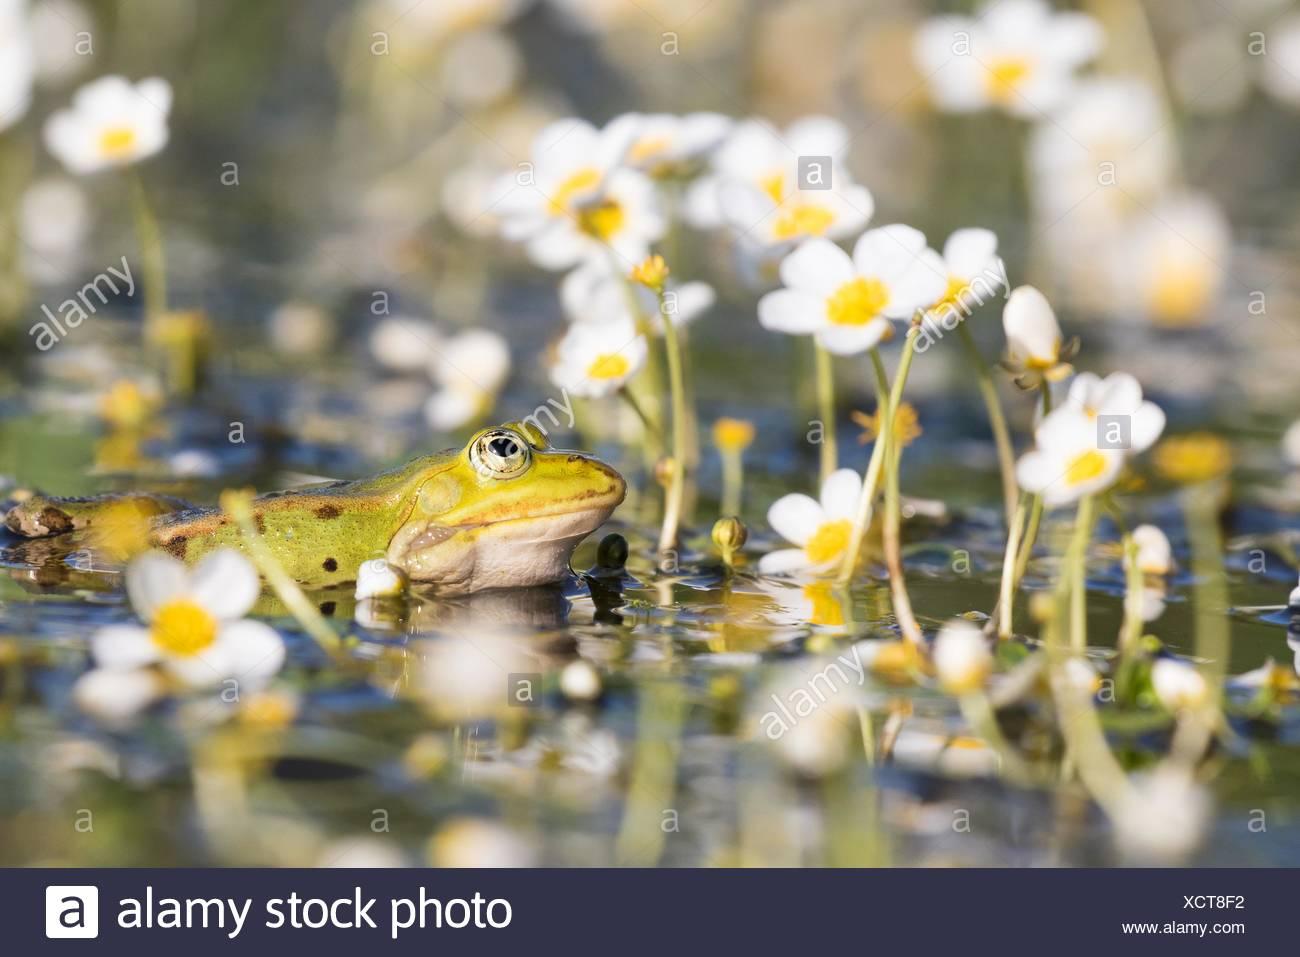 Edible frog (Pelophylax kl. esculentus) in pond amongst white water-crowfoot (Ranunculus aquatilis), Hesse, Germany - Stock Image